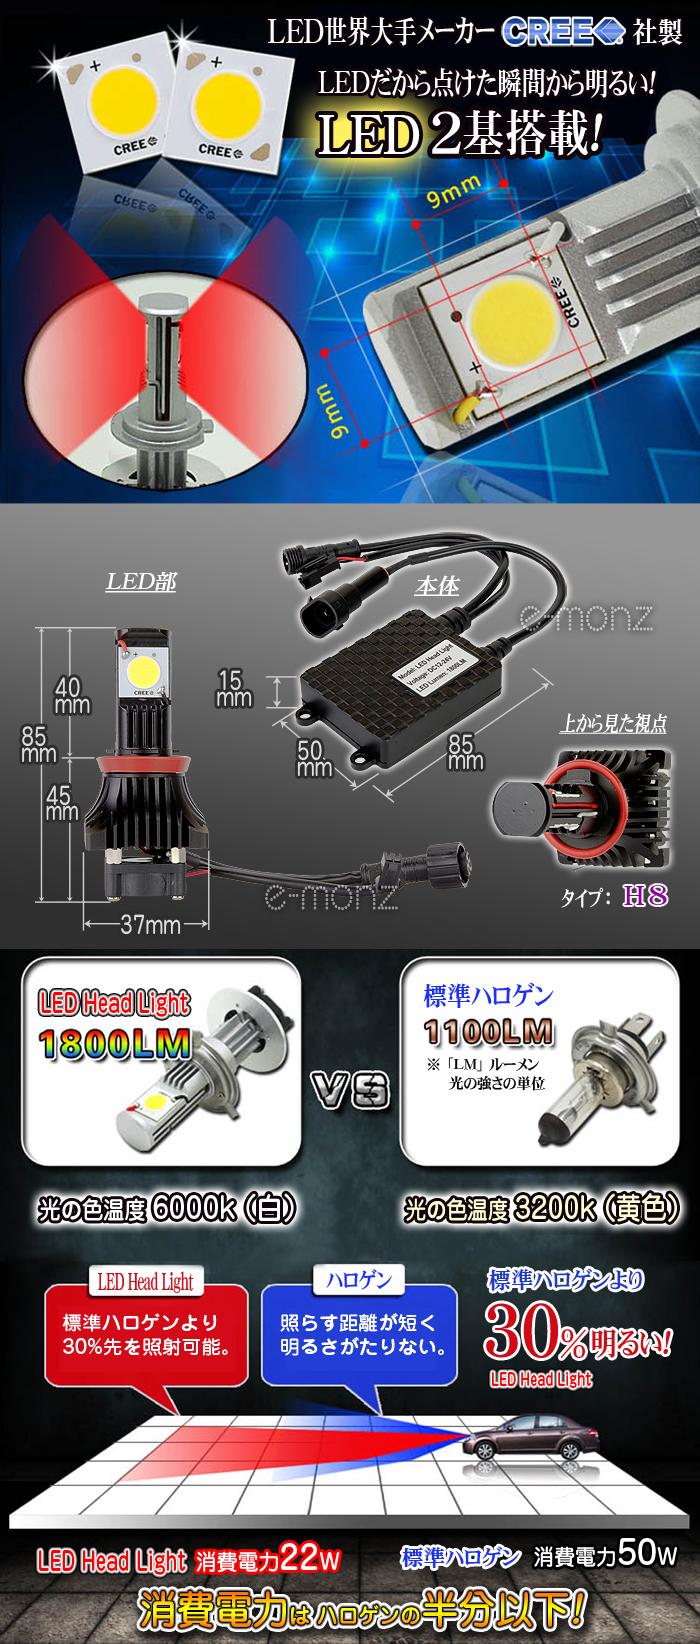 LEDヘッドライト用バルブ H8 CREE製チップ搭載で安心